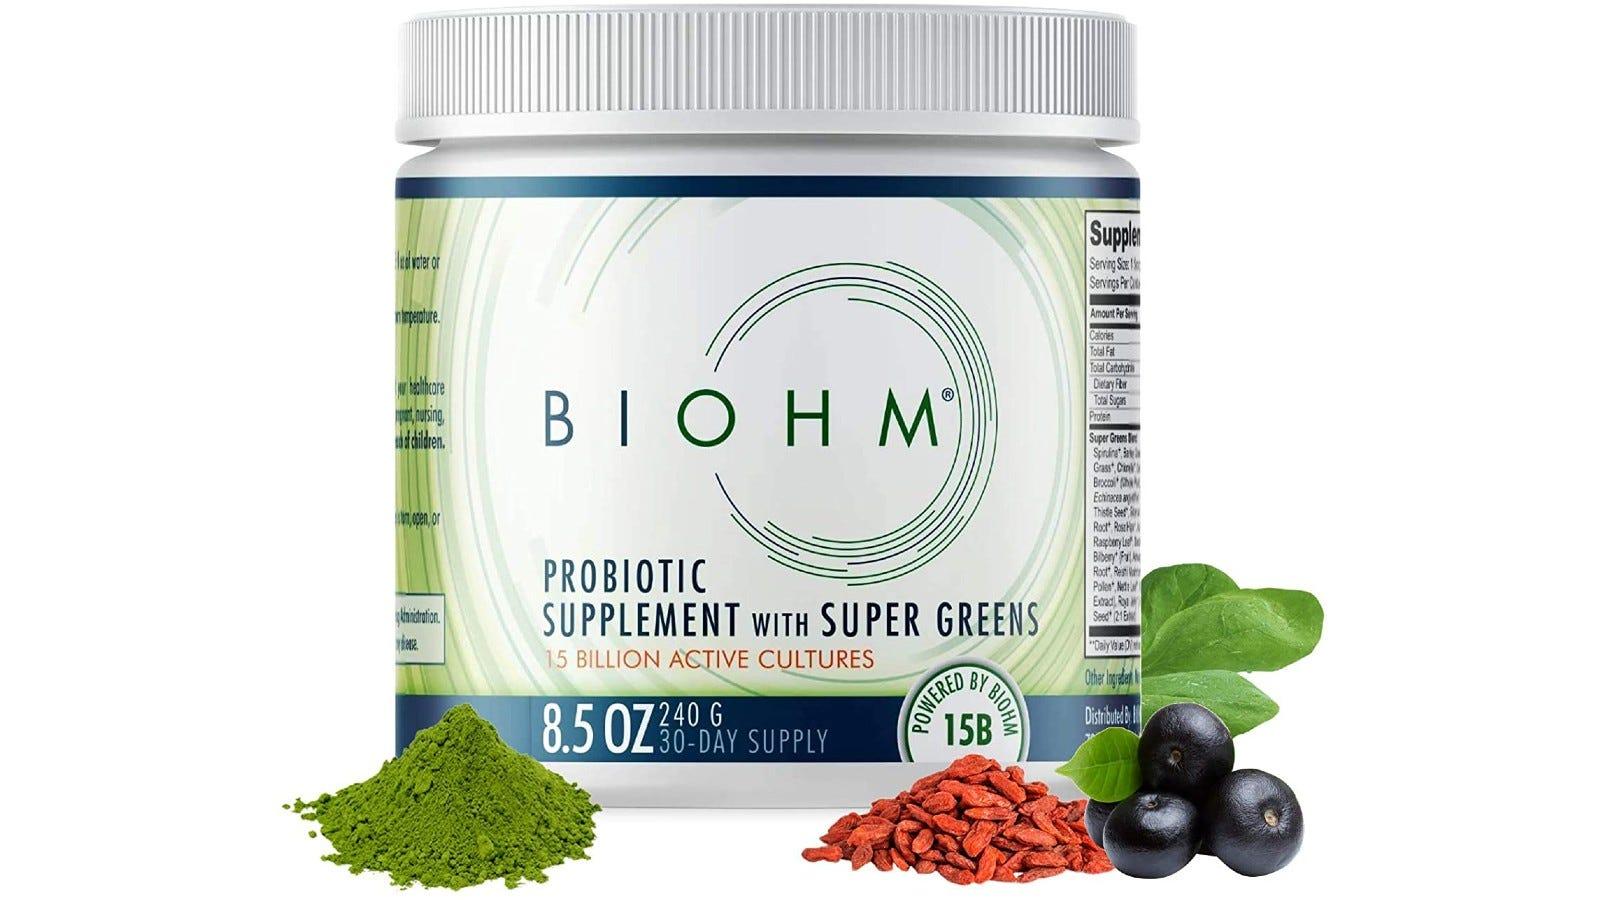 smaller container of Biohm superfood powder that has probiotics